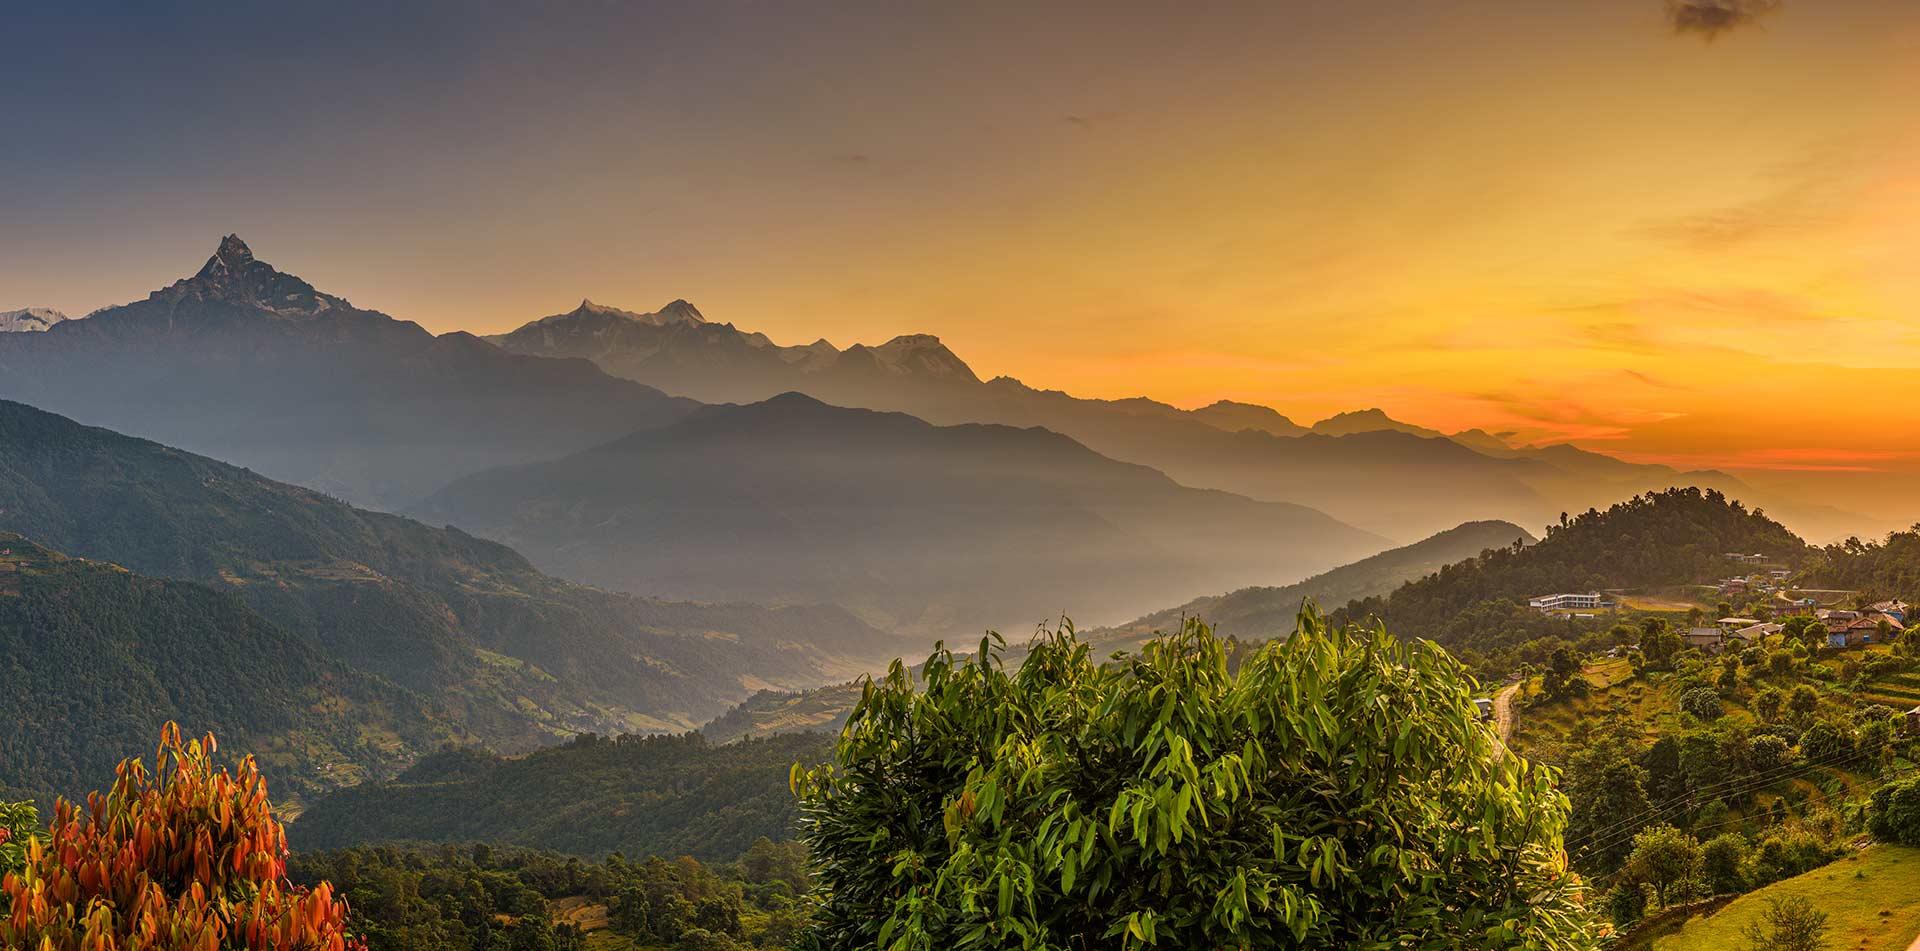 Nepal sunrise over Himalaya mountains